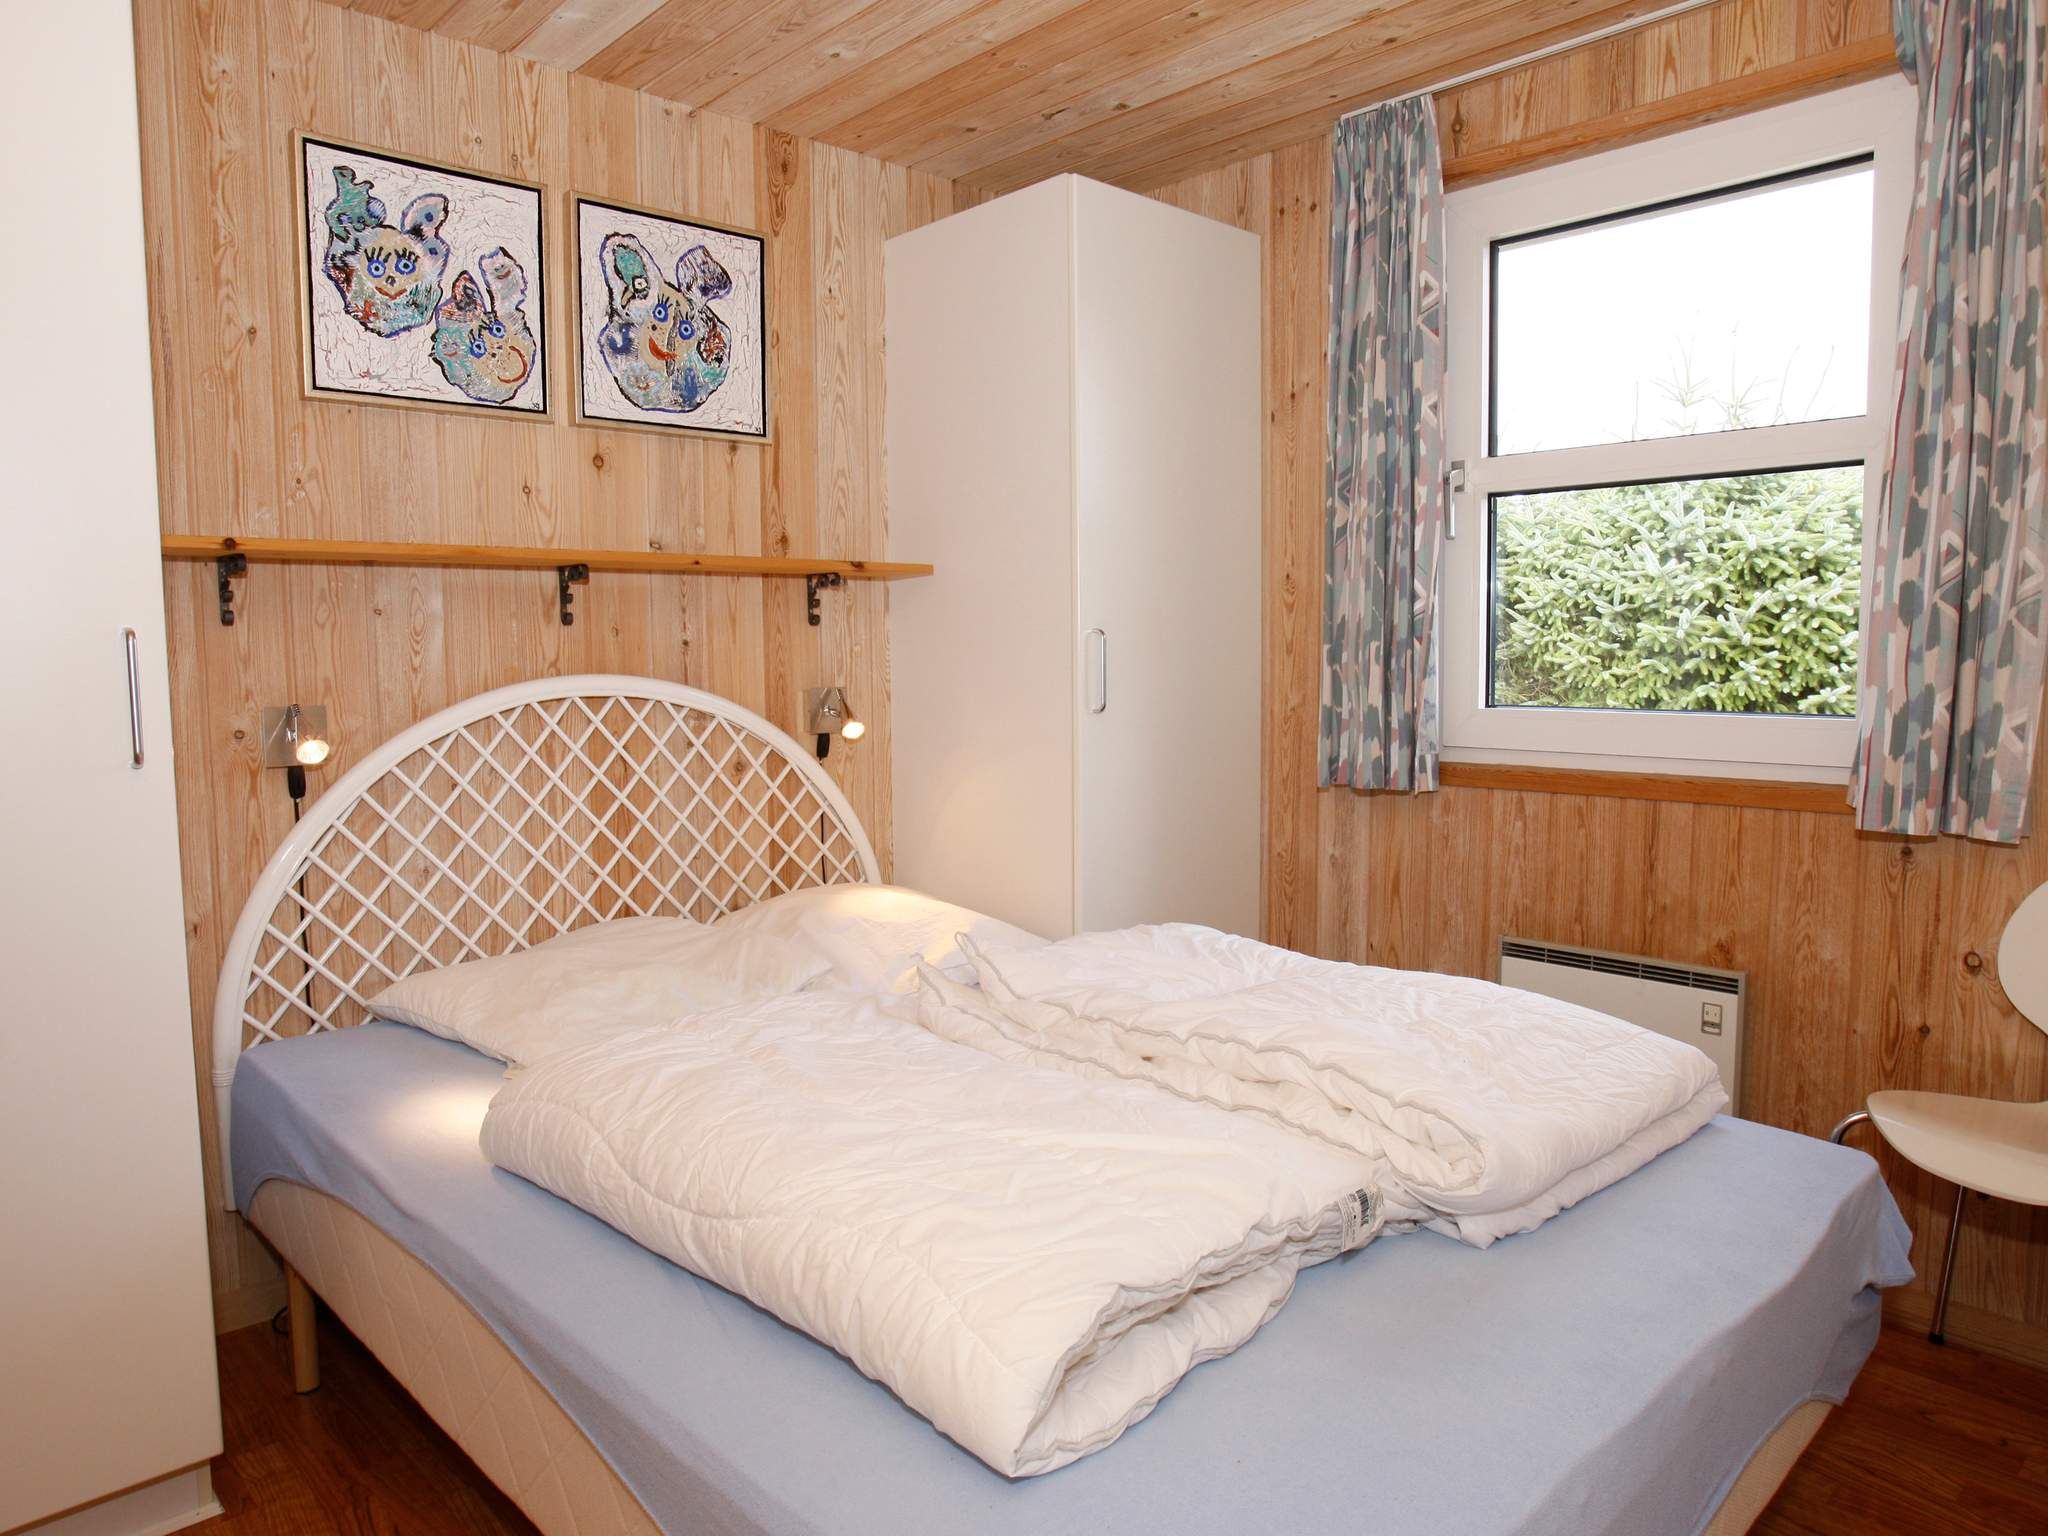 Ferienhaus Øster Hurup (89296), Øster Hurup, , Ostjütland, Dänemark, Bild 11